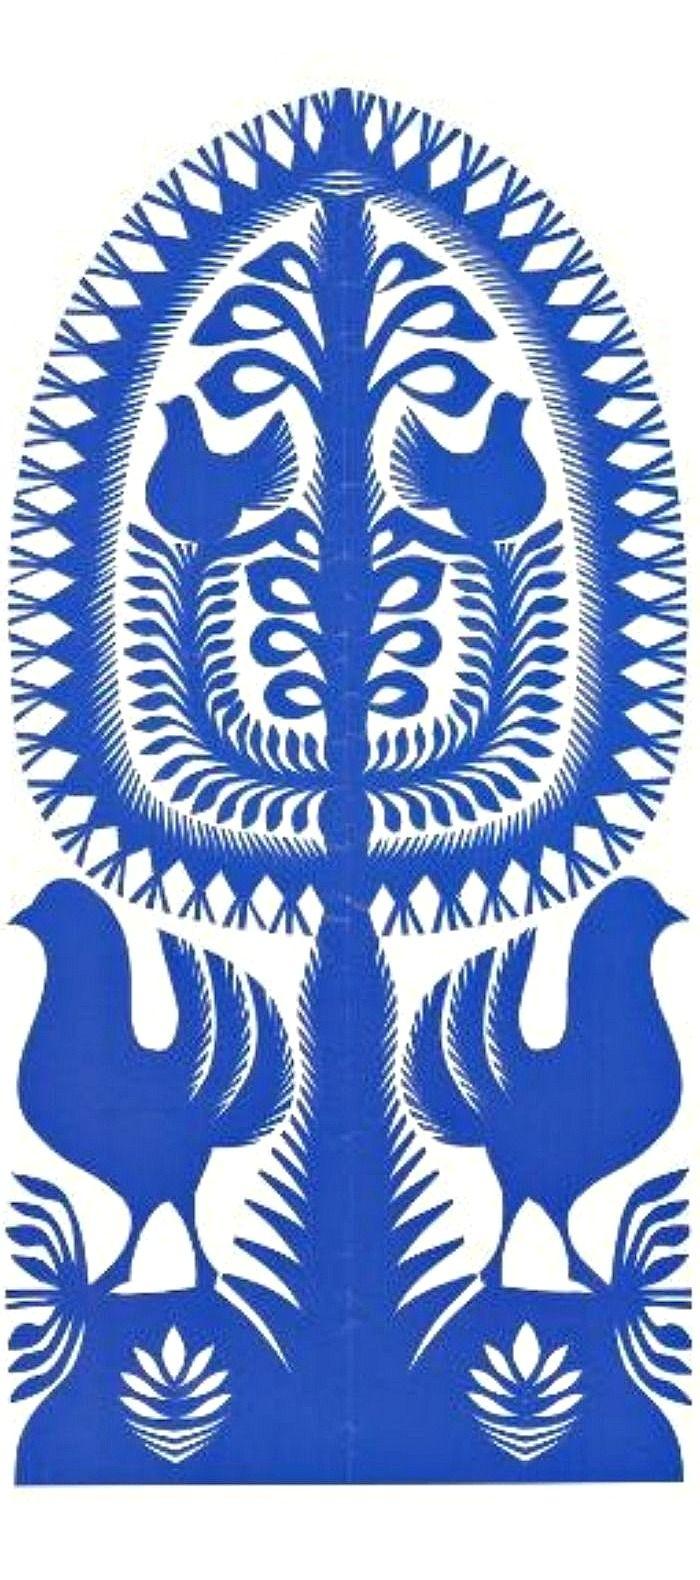 POLISH FOLK ART - Wycinanki - traditional papercut art from Poland, created by artist in Wiesława Bogdańska.